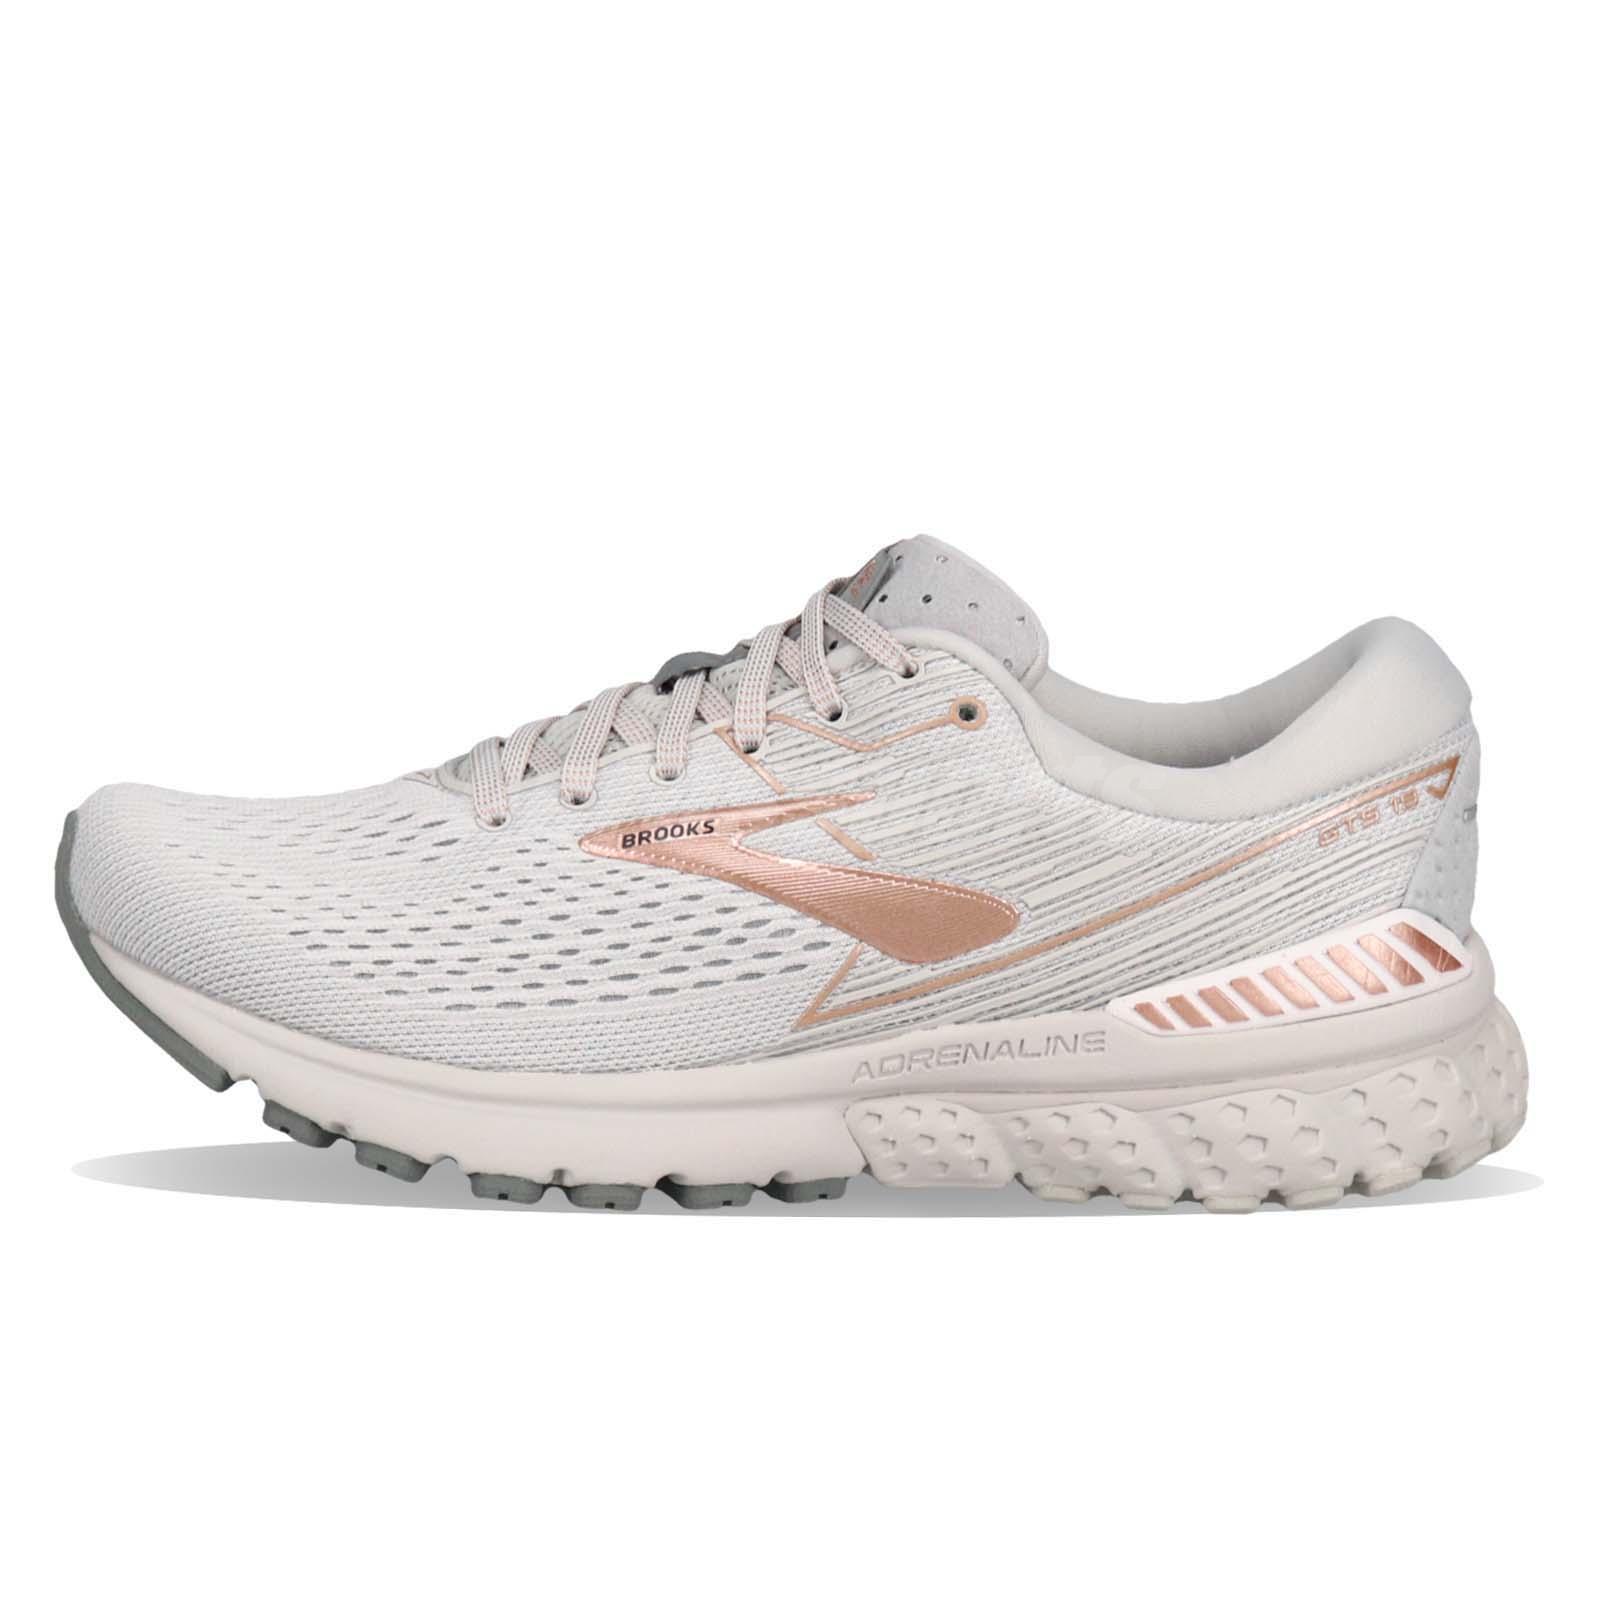 d4dc38c0c485a Brooks Adrenaline GTS 19 Grey Copper White Women Running Shoes Sneaker  120284 1B